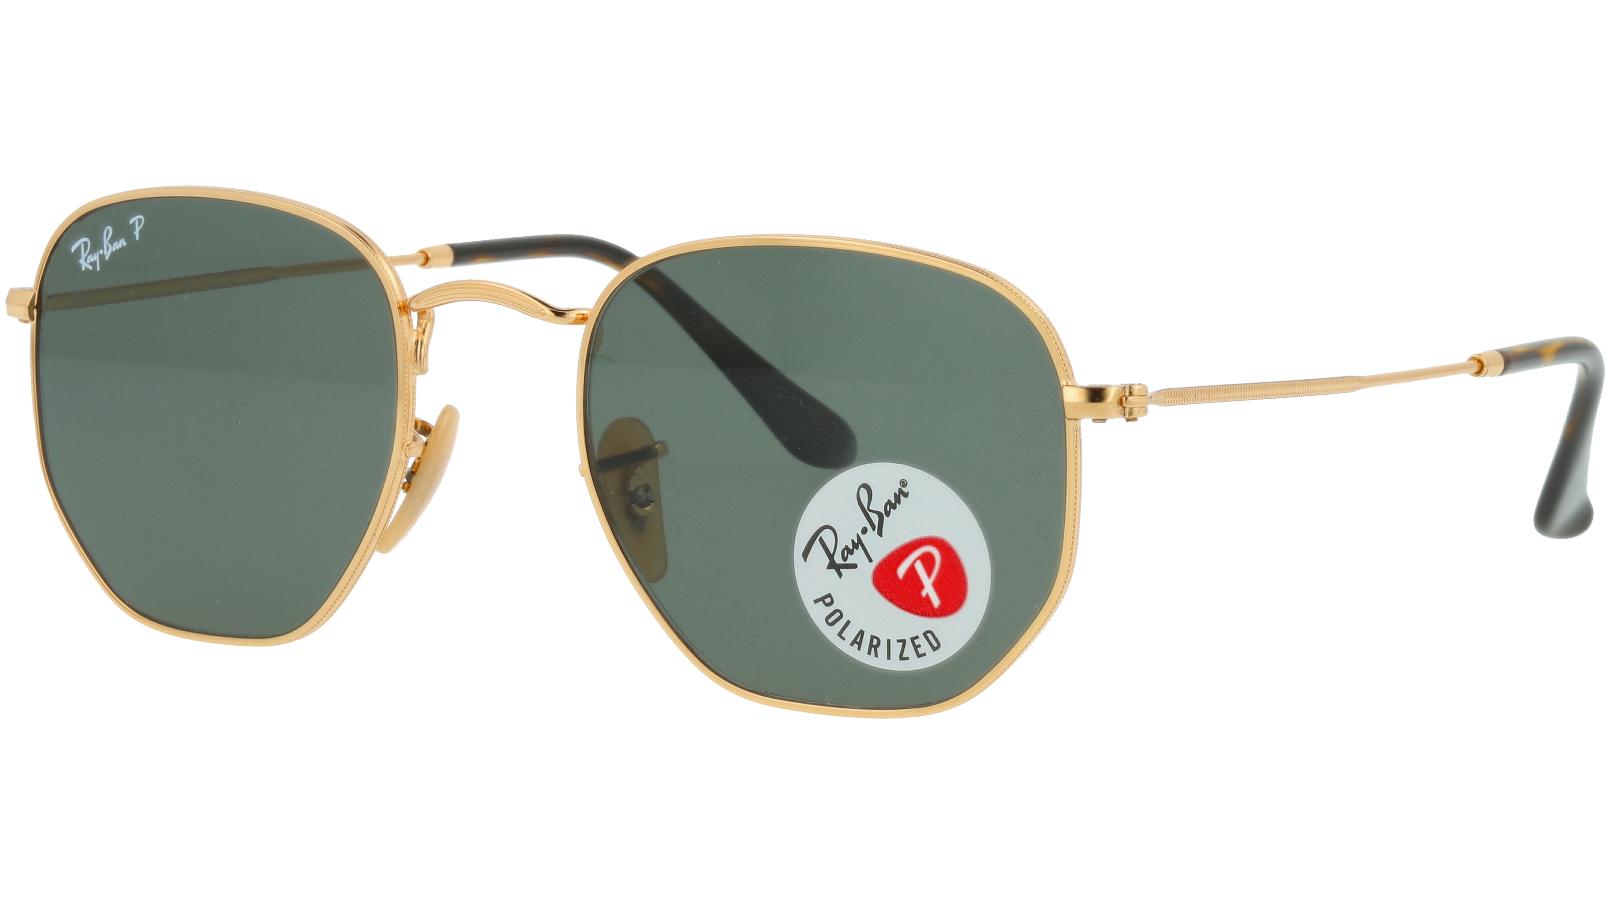 Ray-Ban RB3548N 001/58 Arista Polarized  Sunglasses